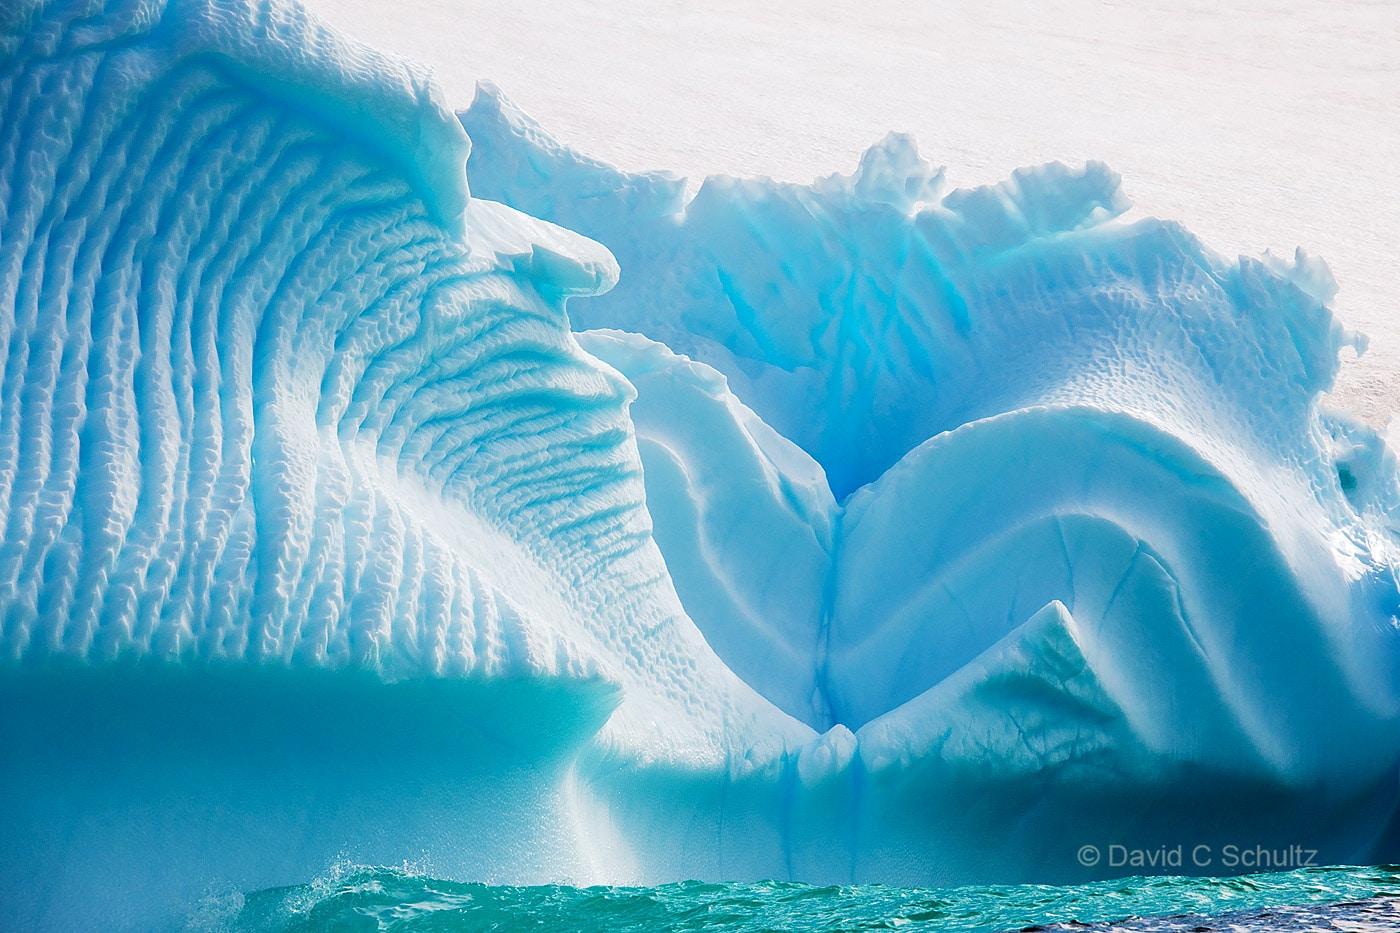 Iceberg in Antarctica - Image #167-761